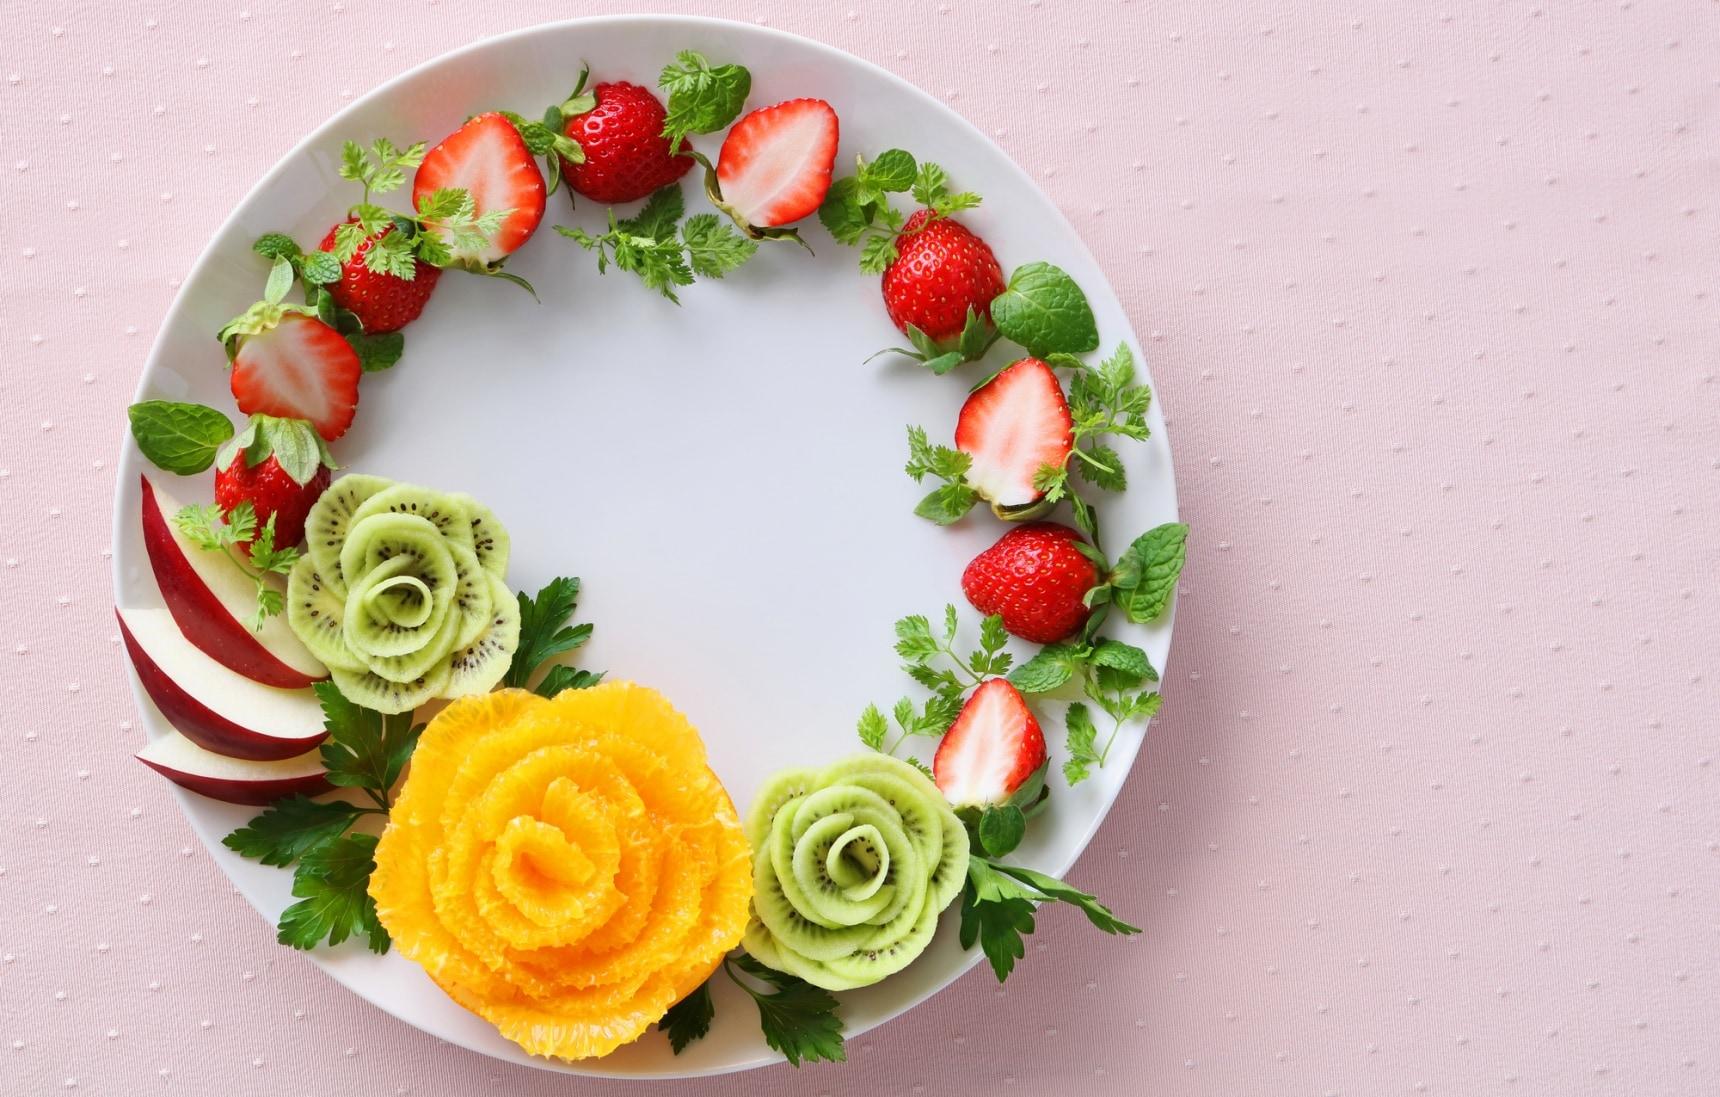 5 Fun & Fruity Activities to Do Around Tokyo